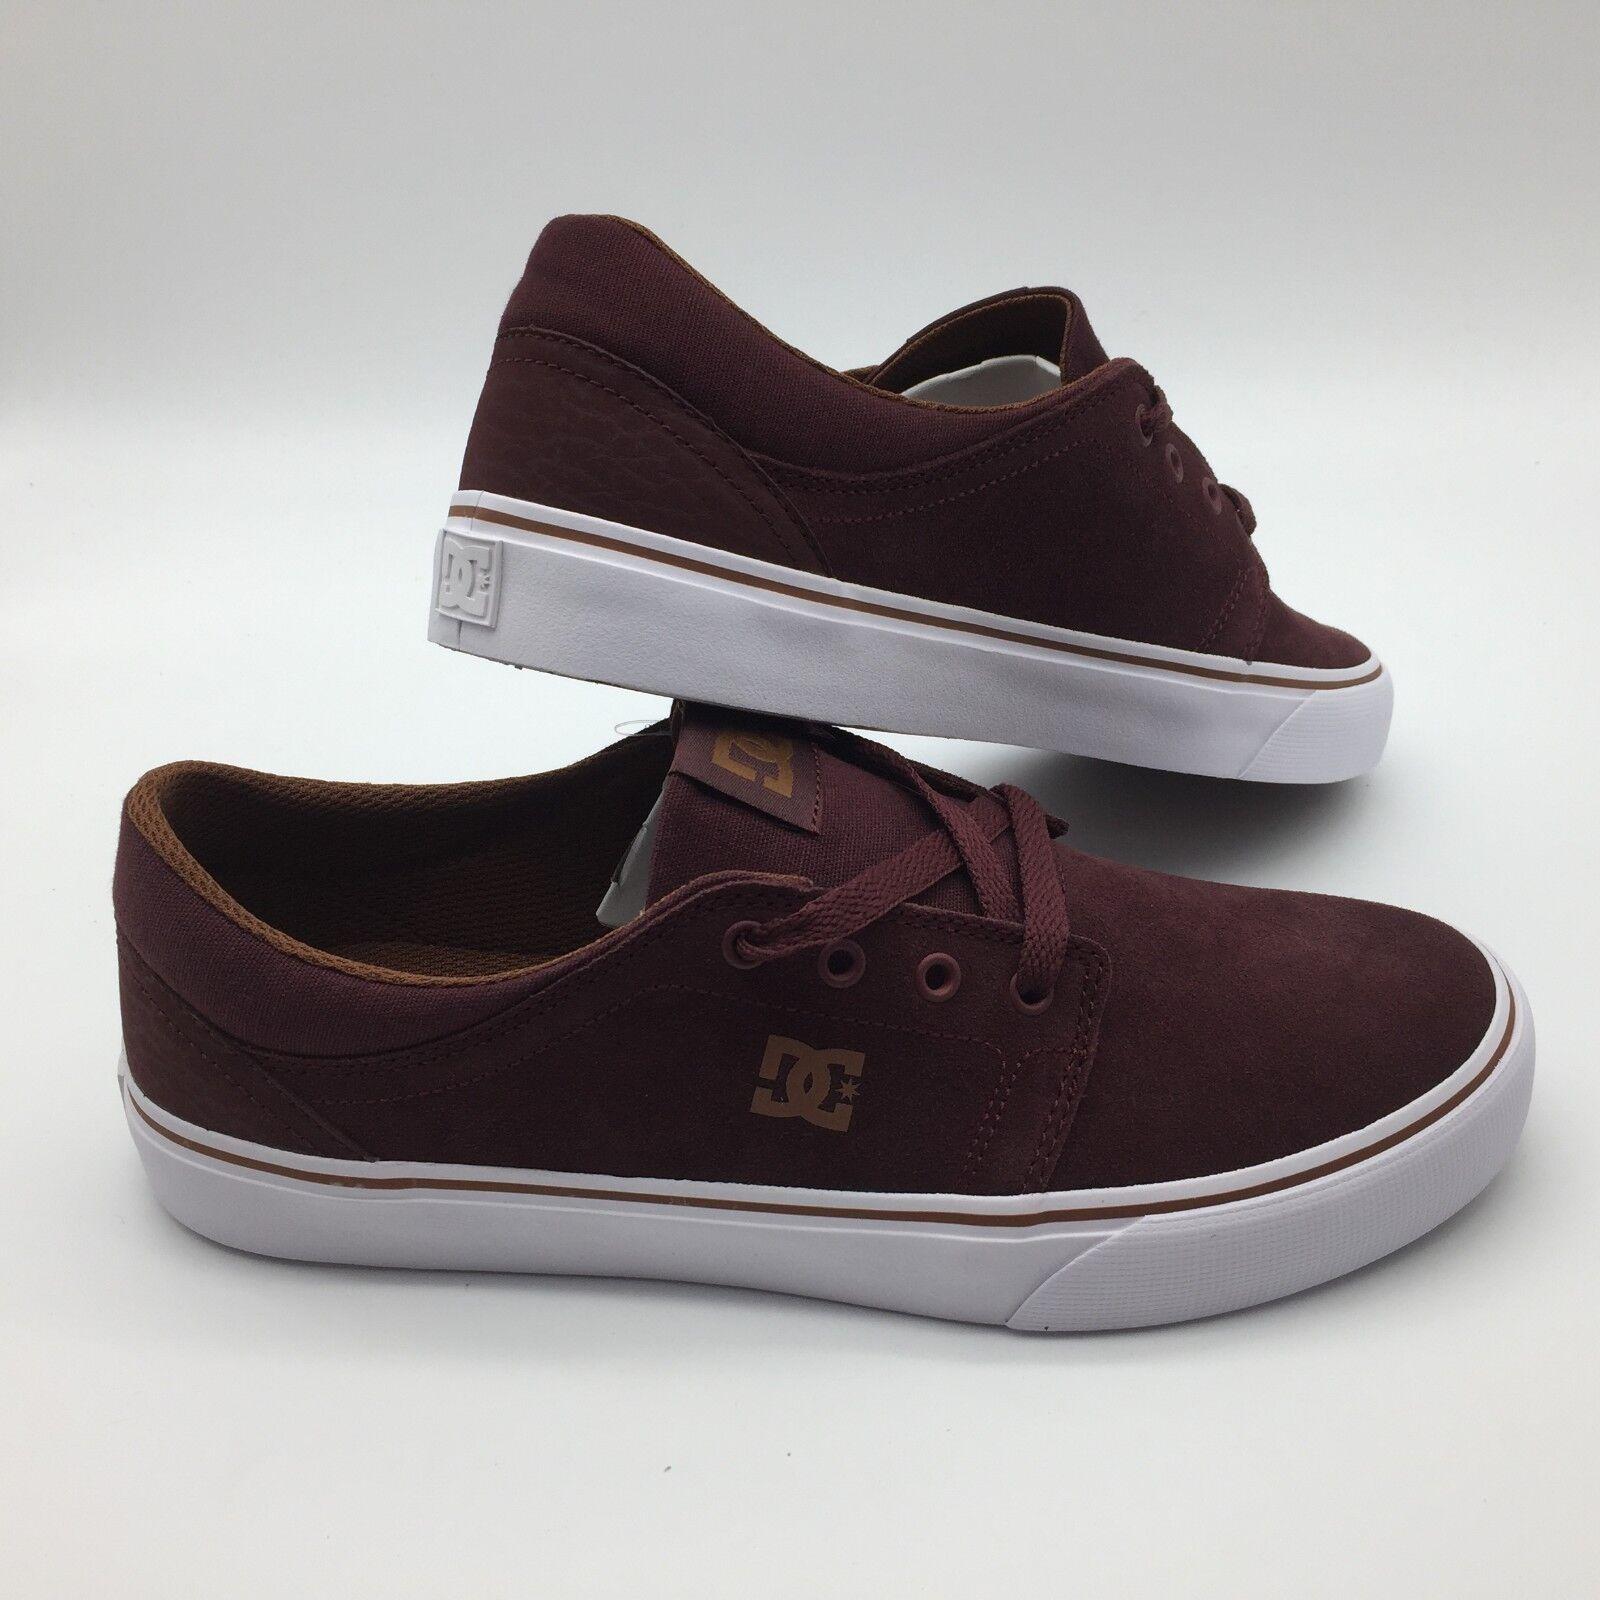 DC Men's shoes  Trase  SD Burgundy(BUR)